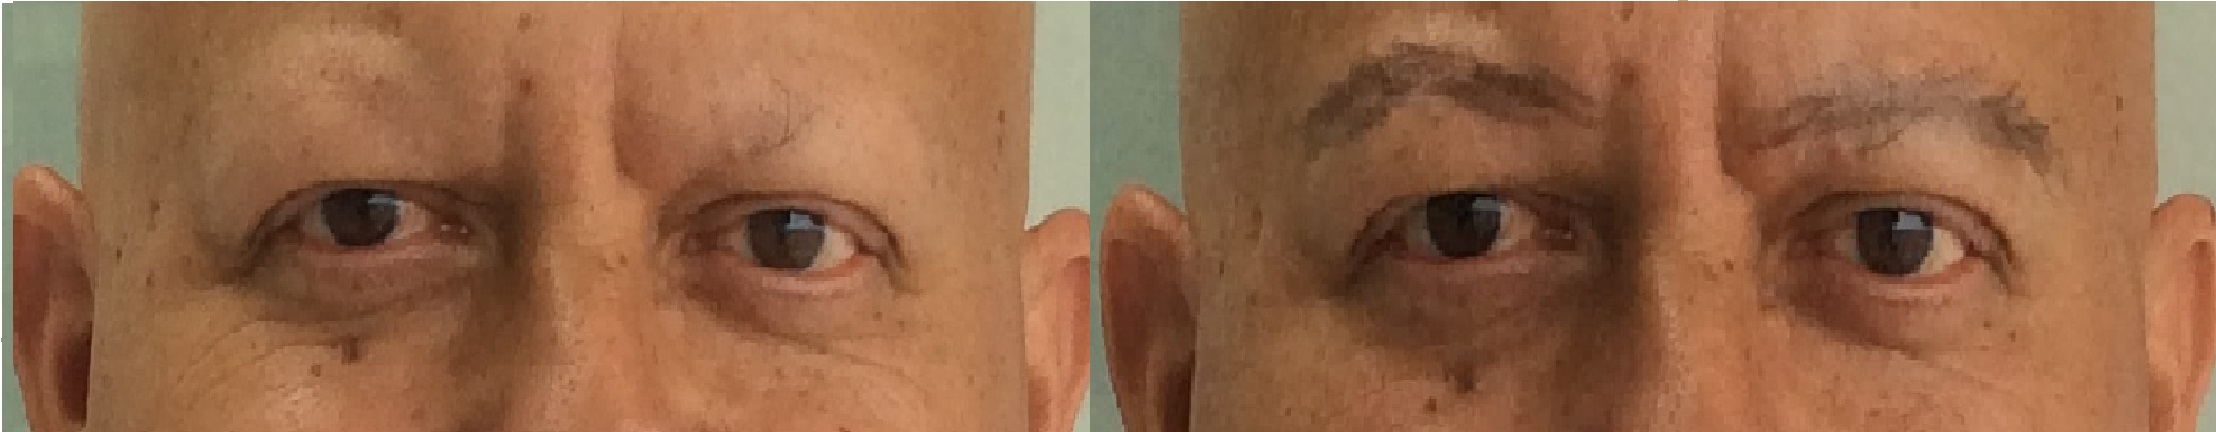 micropigmentación cejas hombres